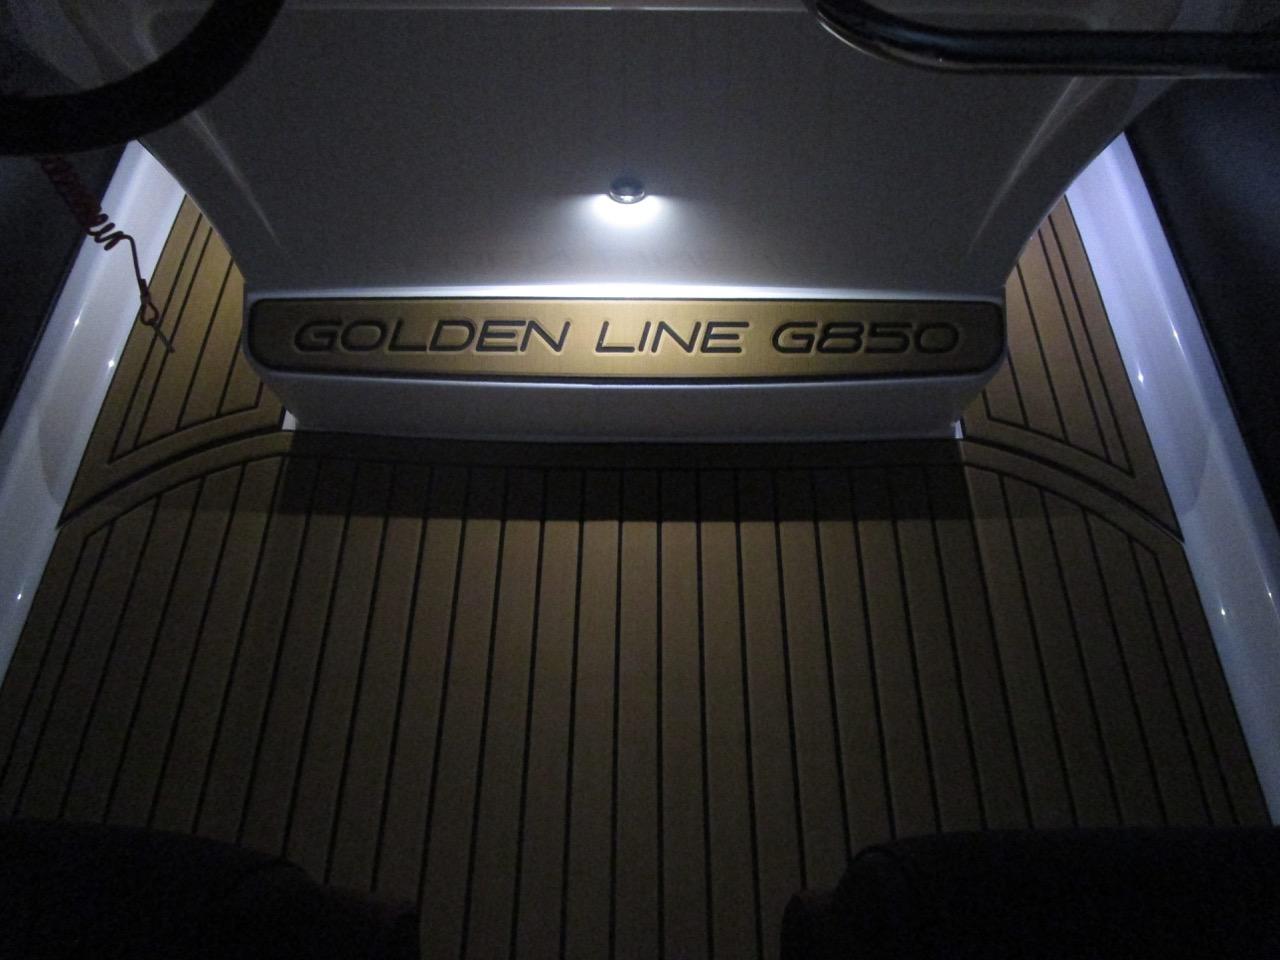 GRAND G850 RIB LED deck lights, helm